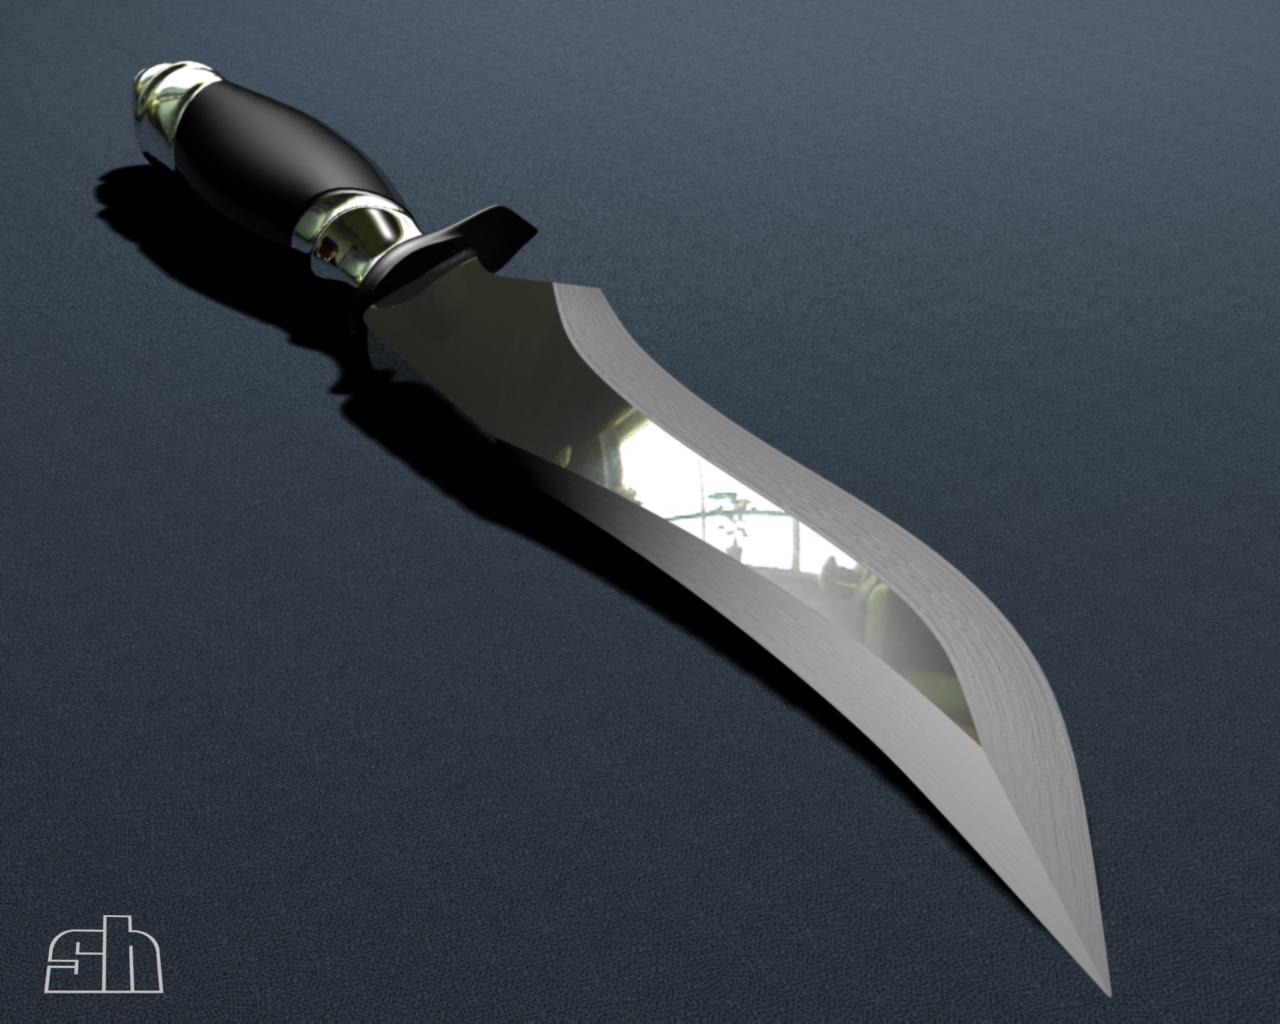 Knife by shinzooo